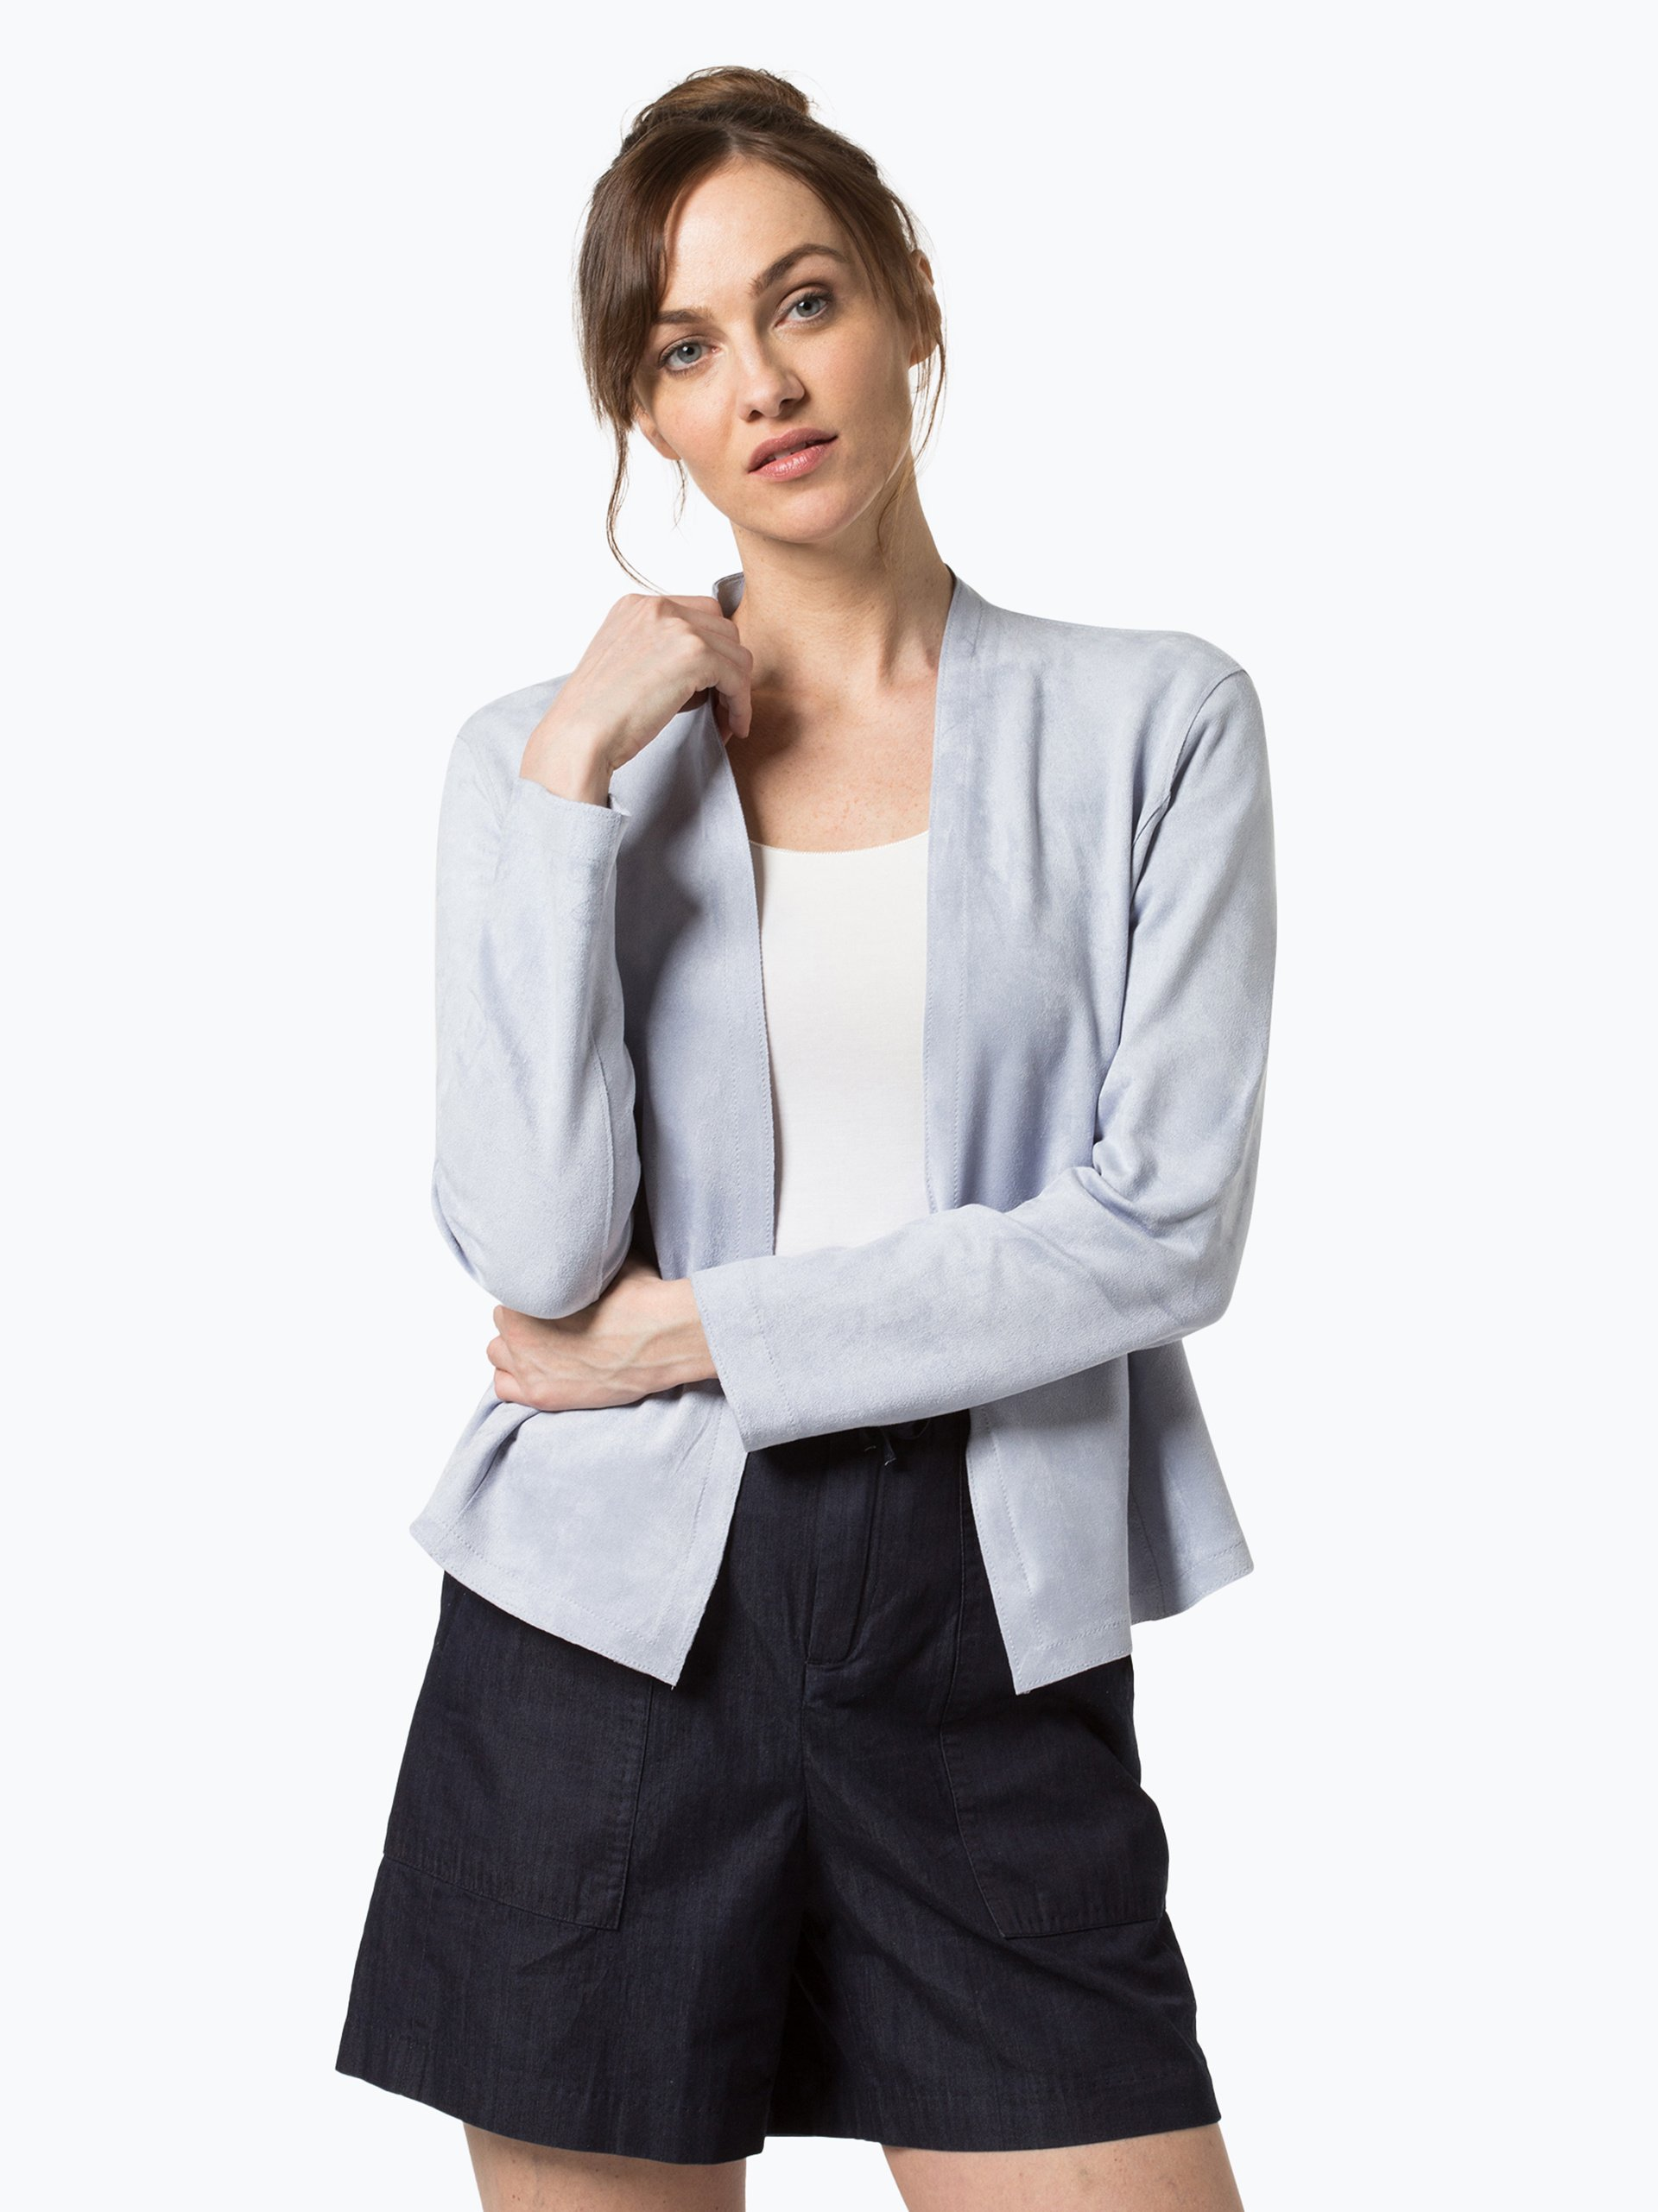 marc cain collections damen blazer hellblau uni online kaufen peek und cloppenburg de. Black Bedroom Furniture Sets. Home Design Ideas